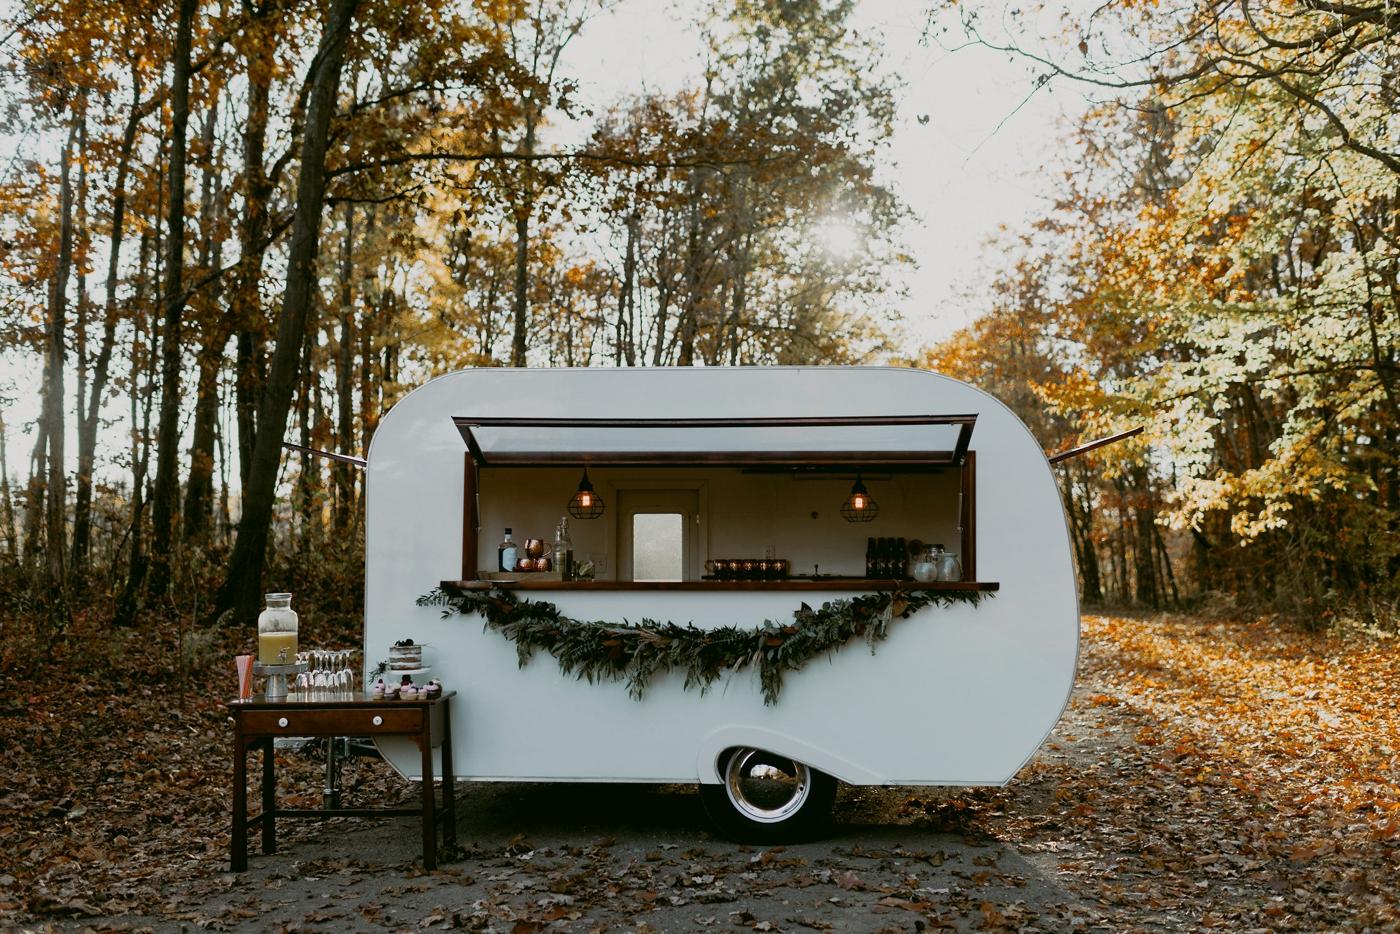 Autumn-Bridal-Shower-Vintage-Caravan-Styled-Shoot_MJPHOTO-15.jpg